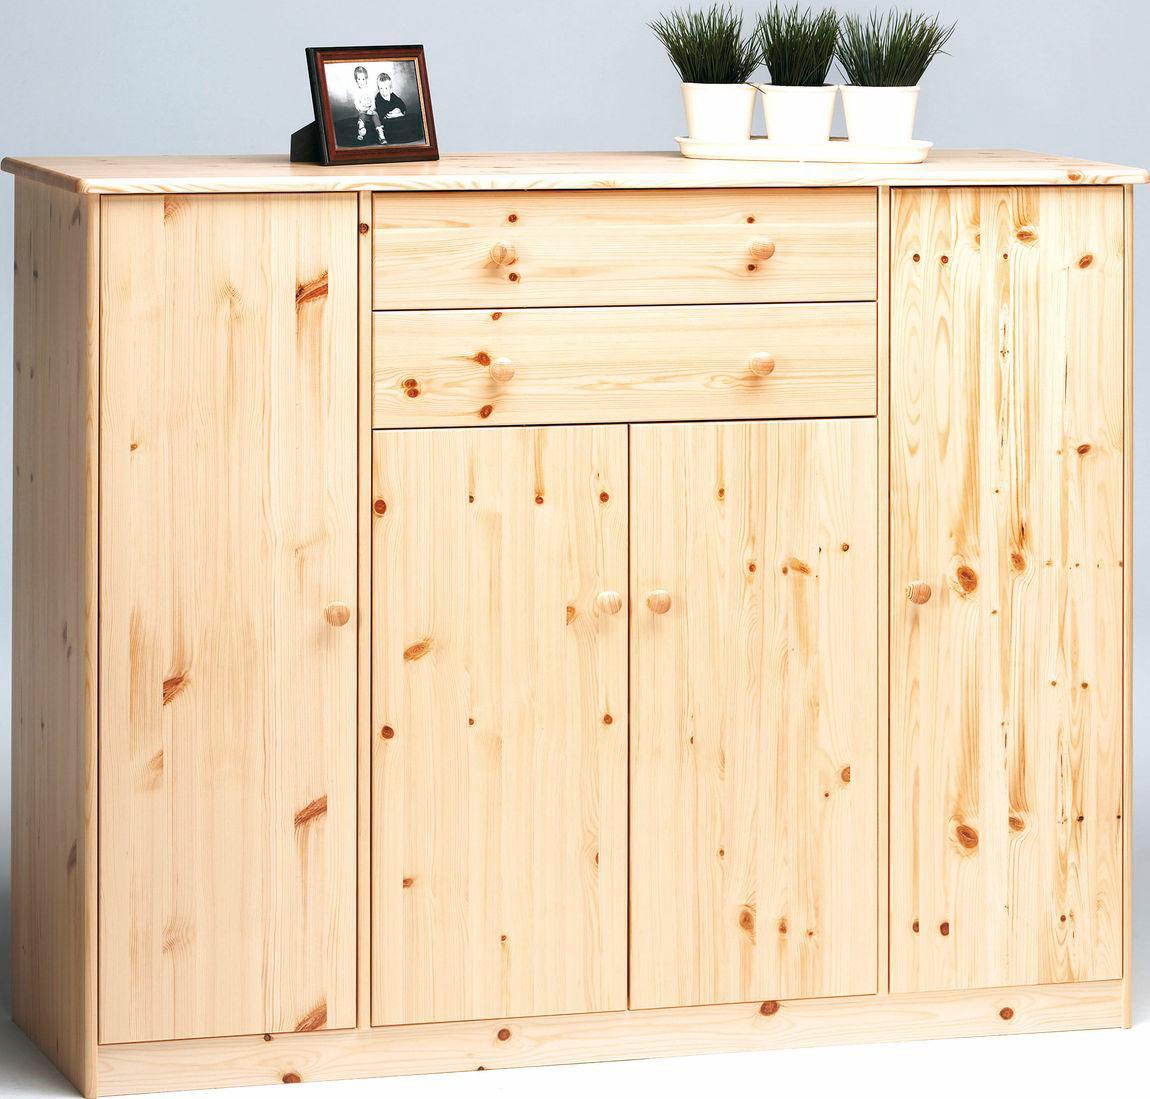 Home affaire Sideboard Mario Breite 150 cm